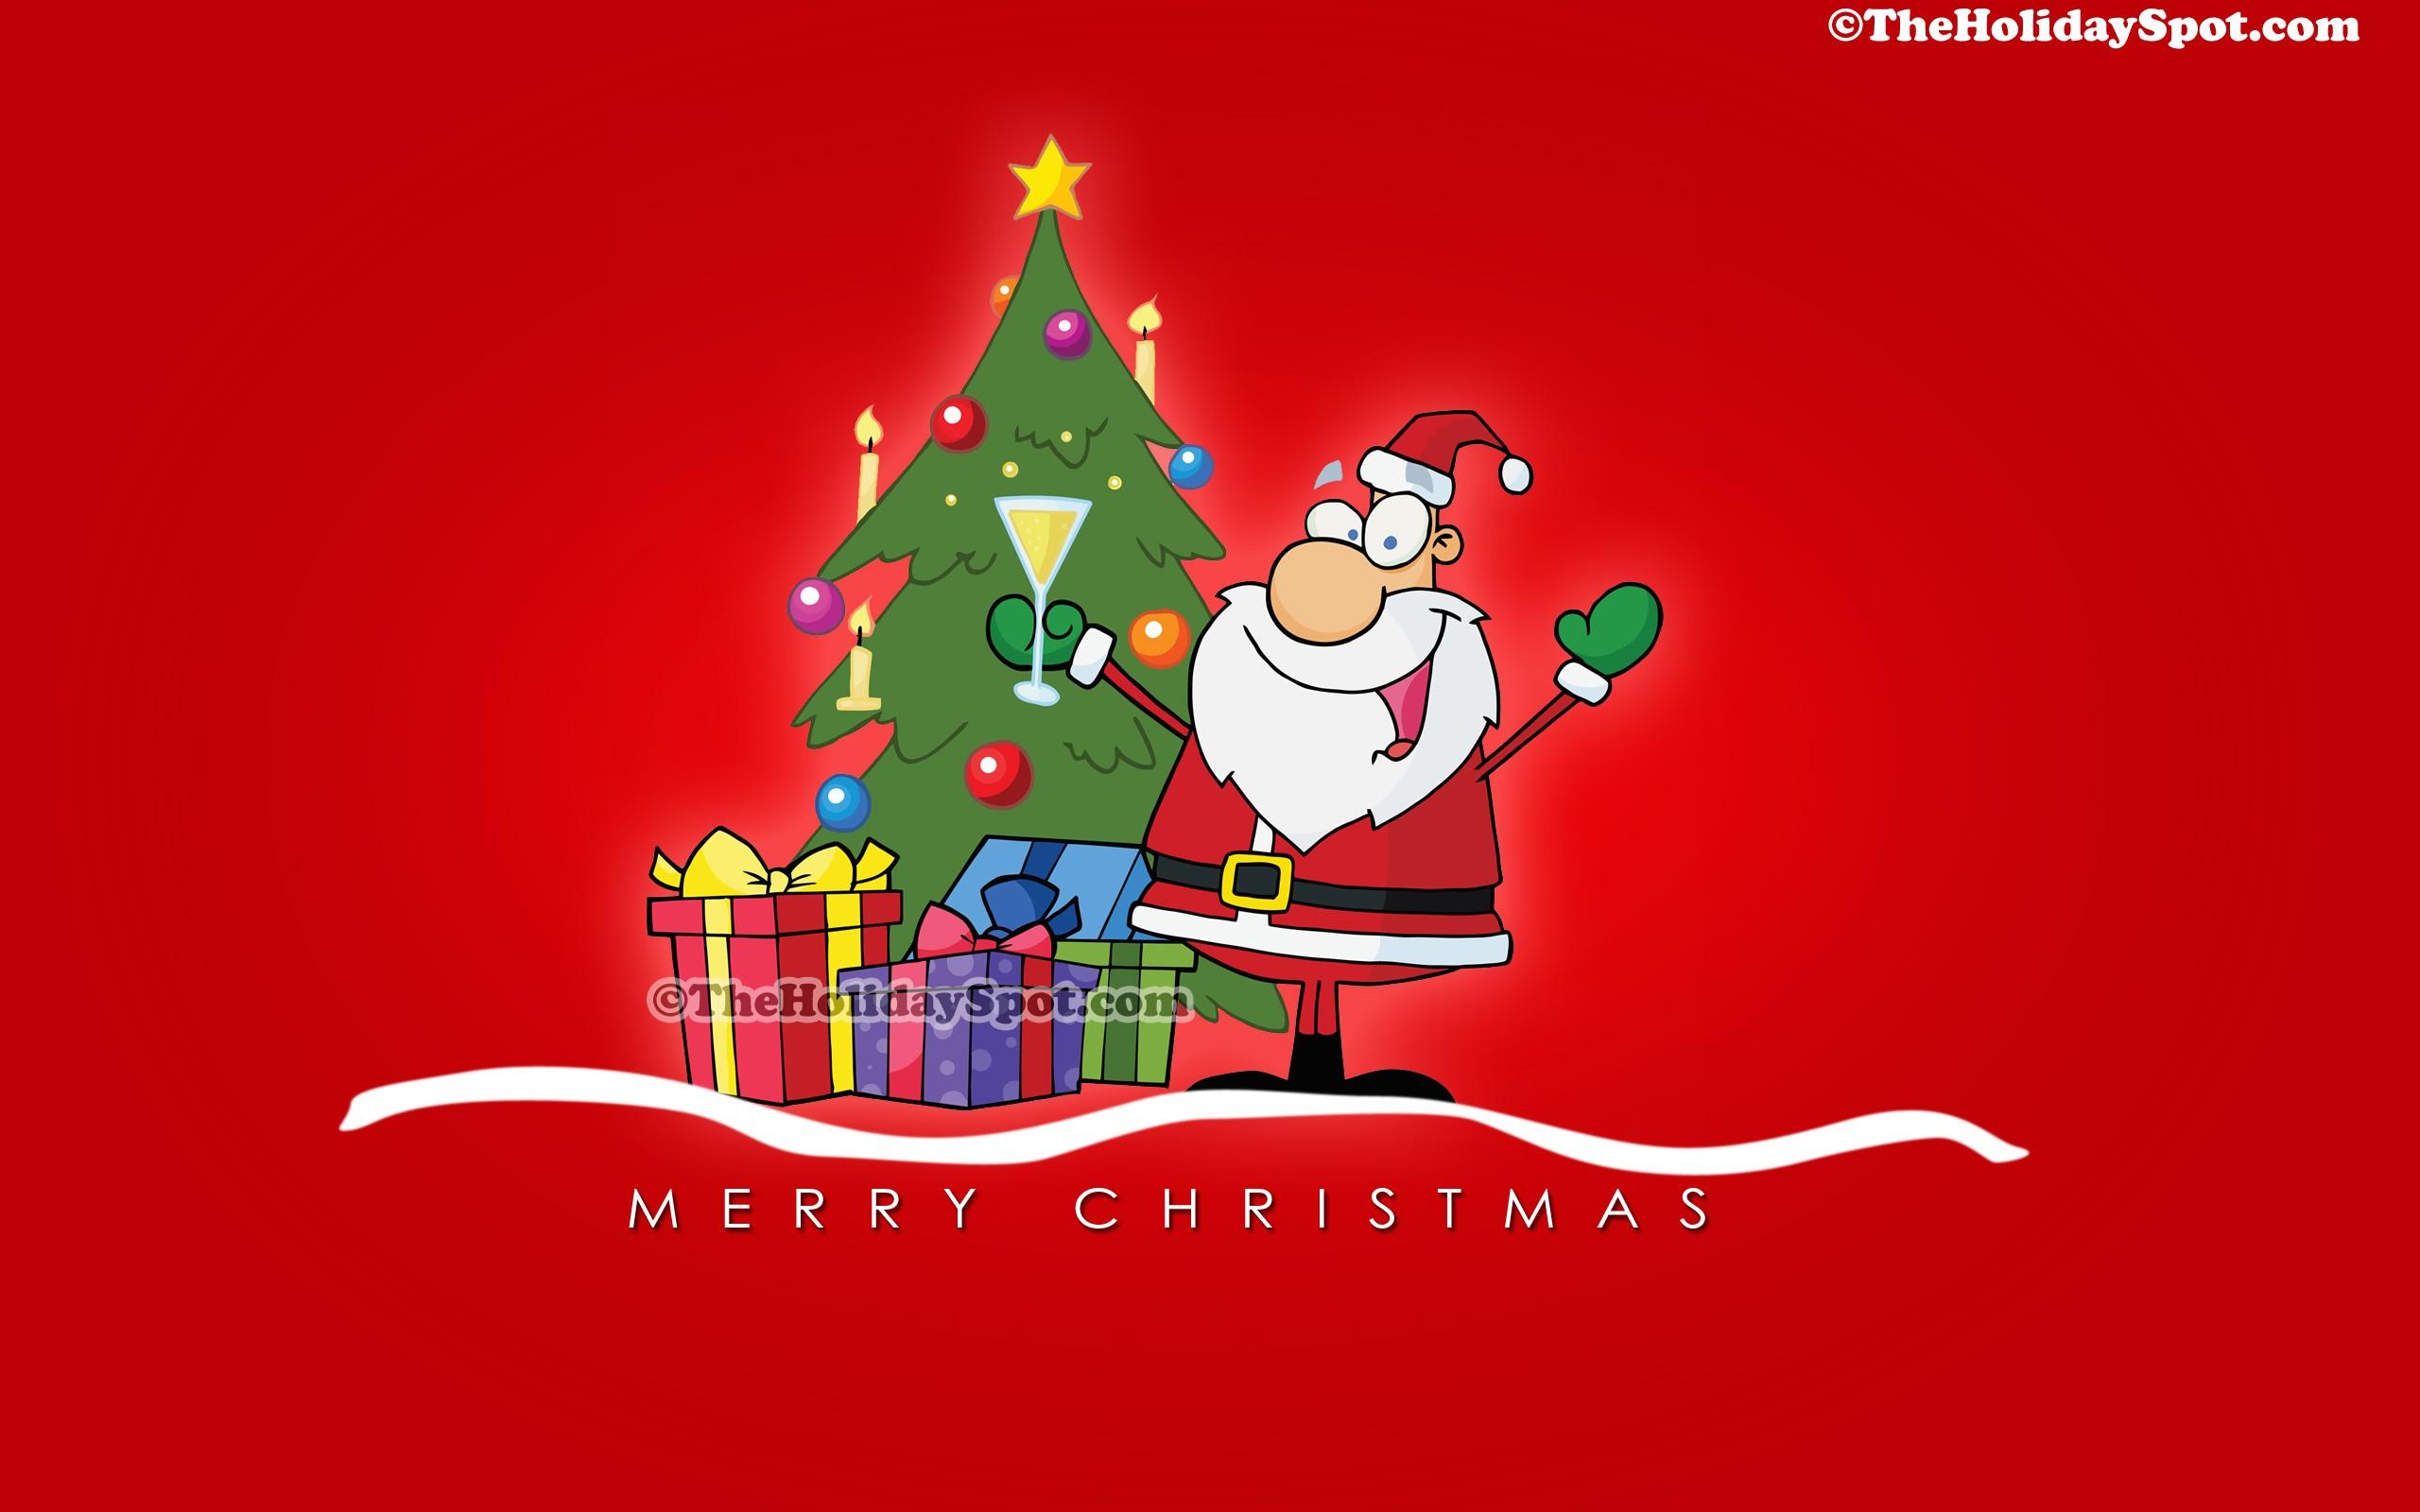 Christmas Cartoon Wallpaper 2560x1600